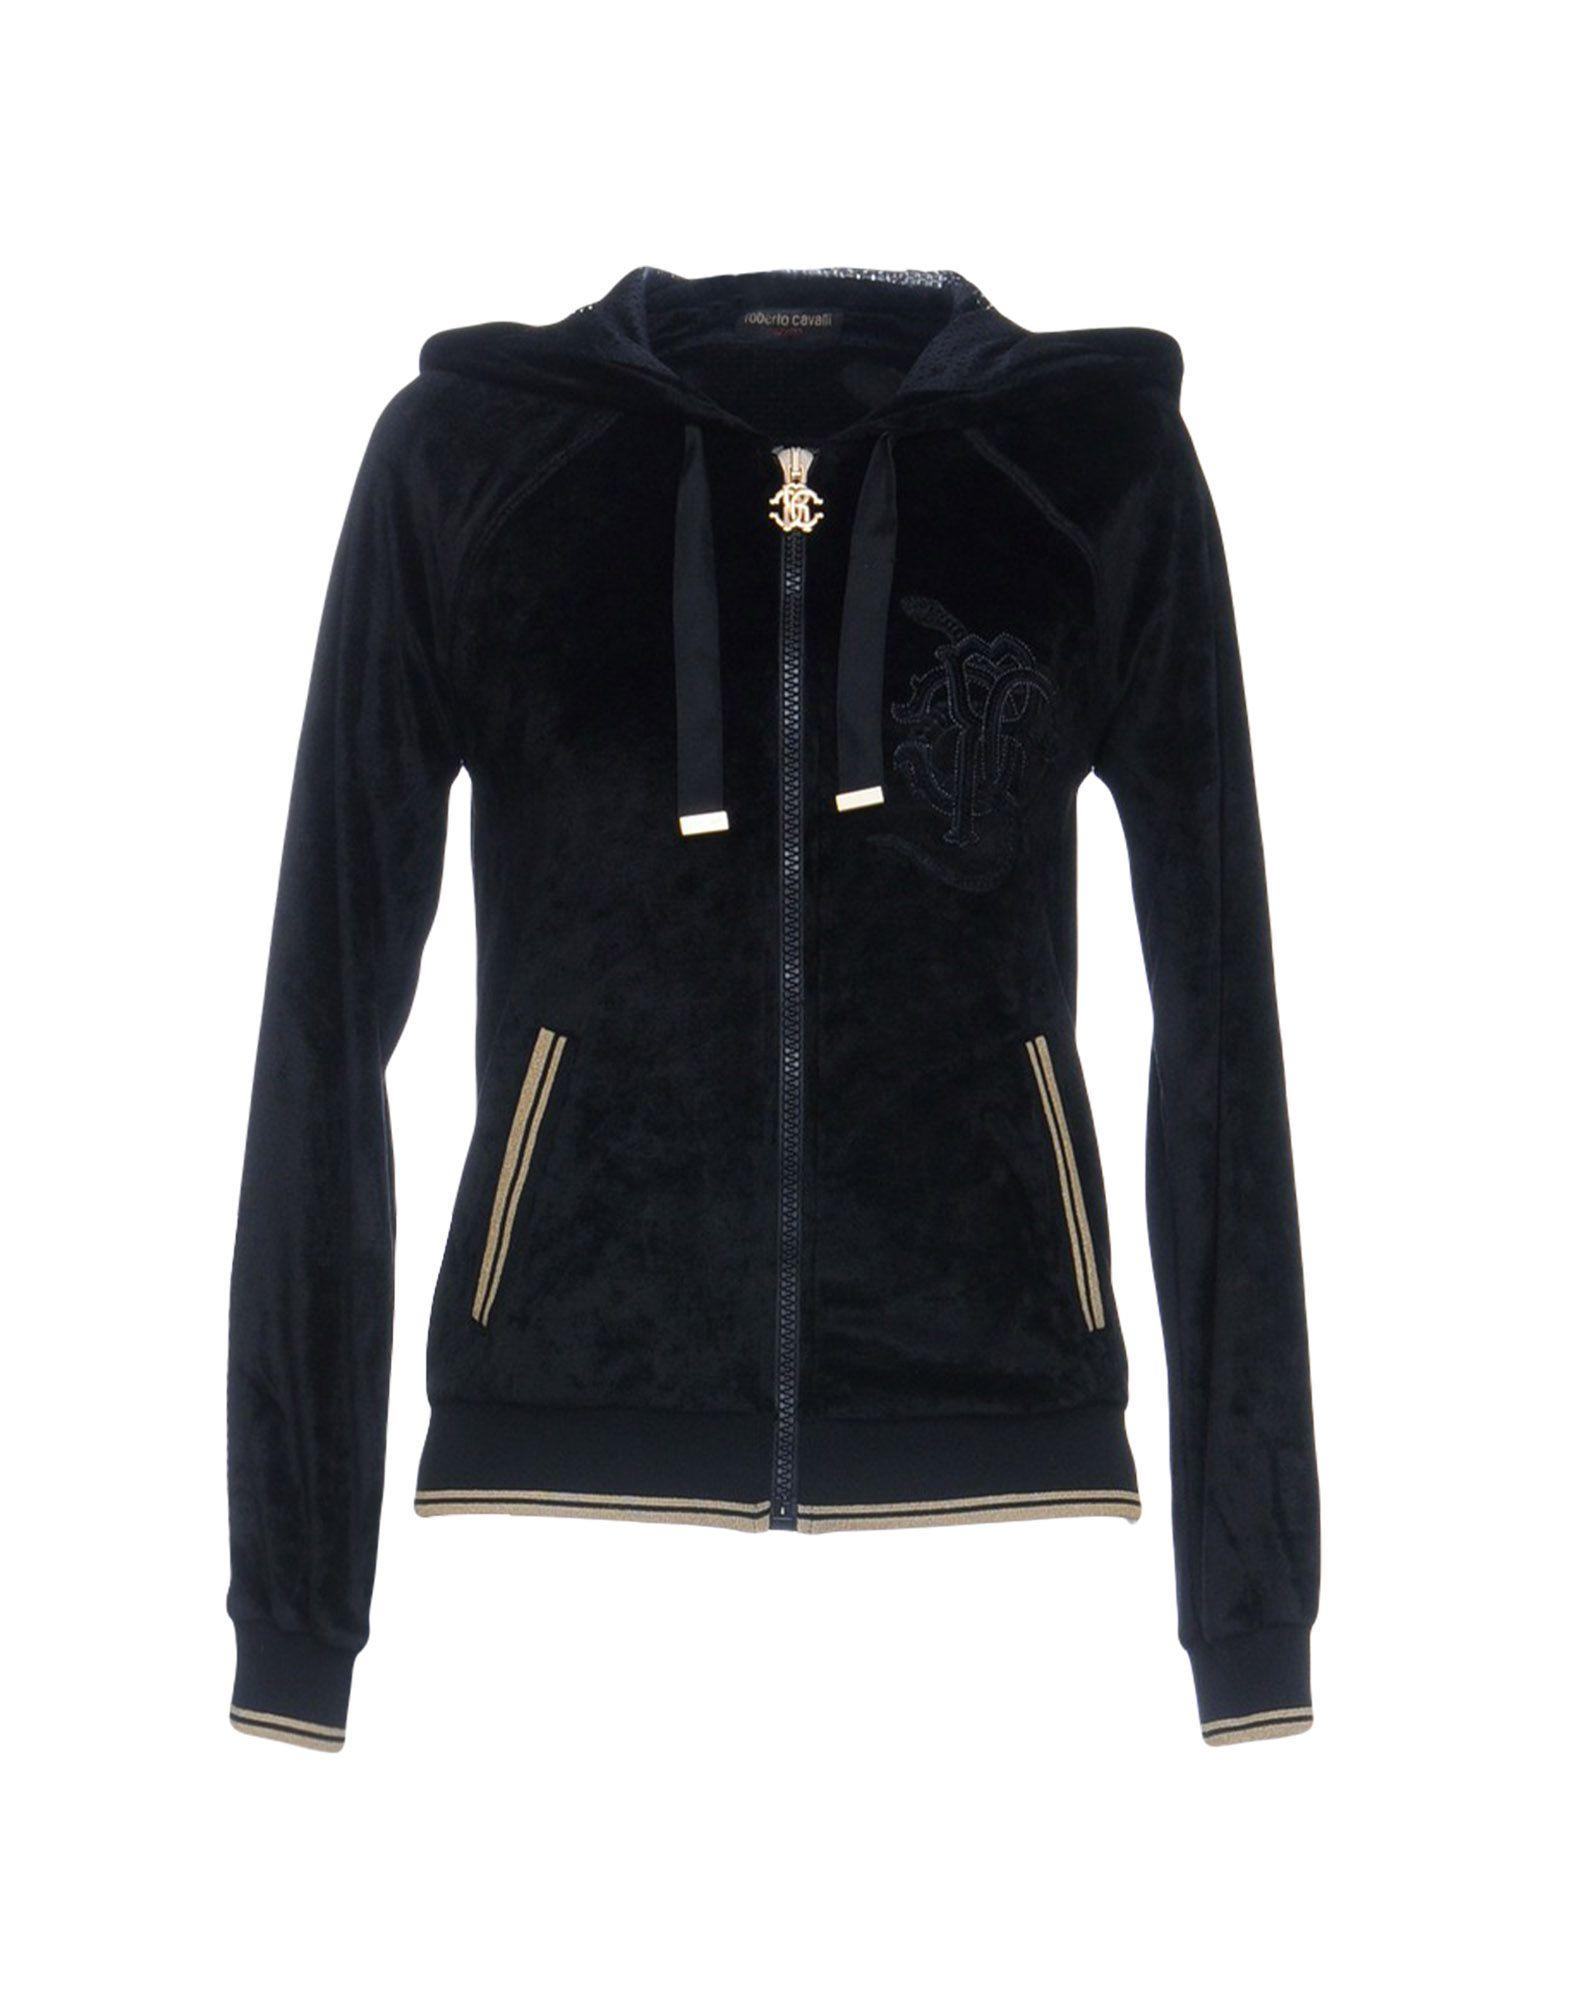 Roberto Cavalli Gym Sweatshirts In Black